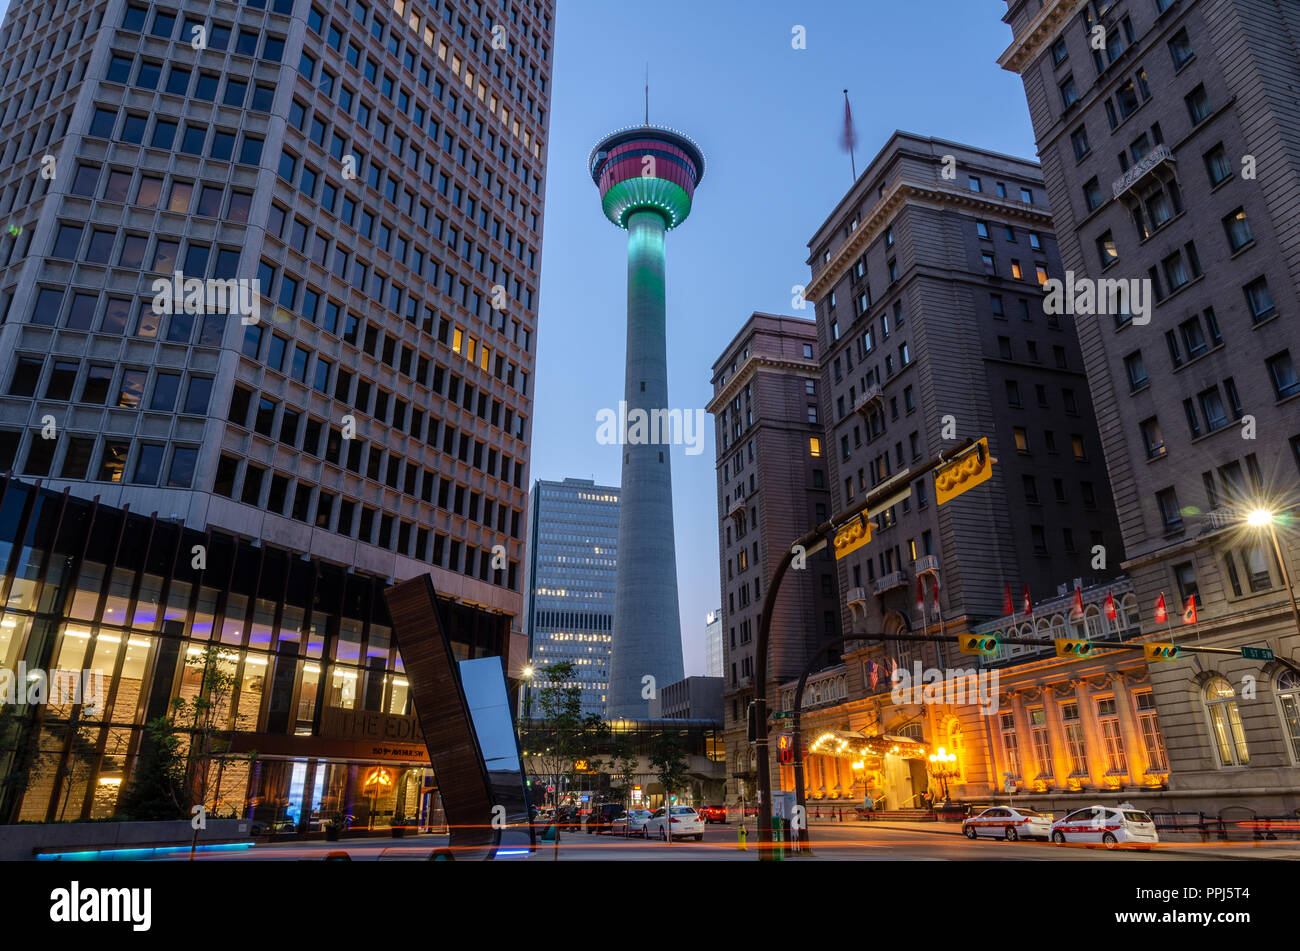 Calgary Tower on 9th Avenue, Calgary - Stock Image